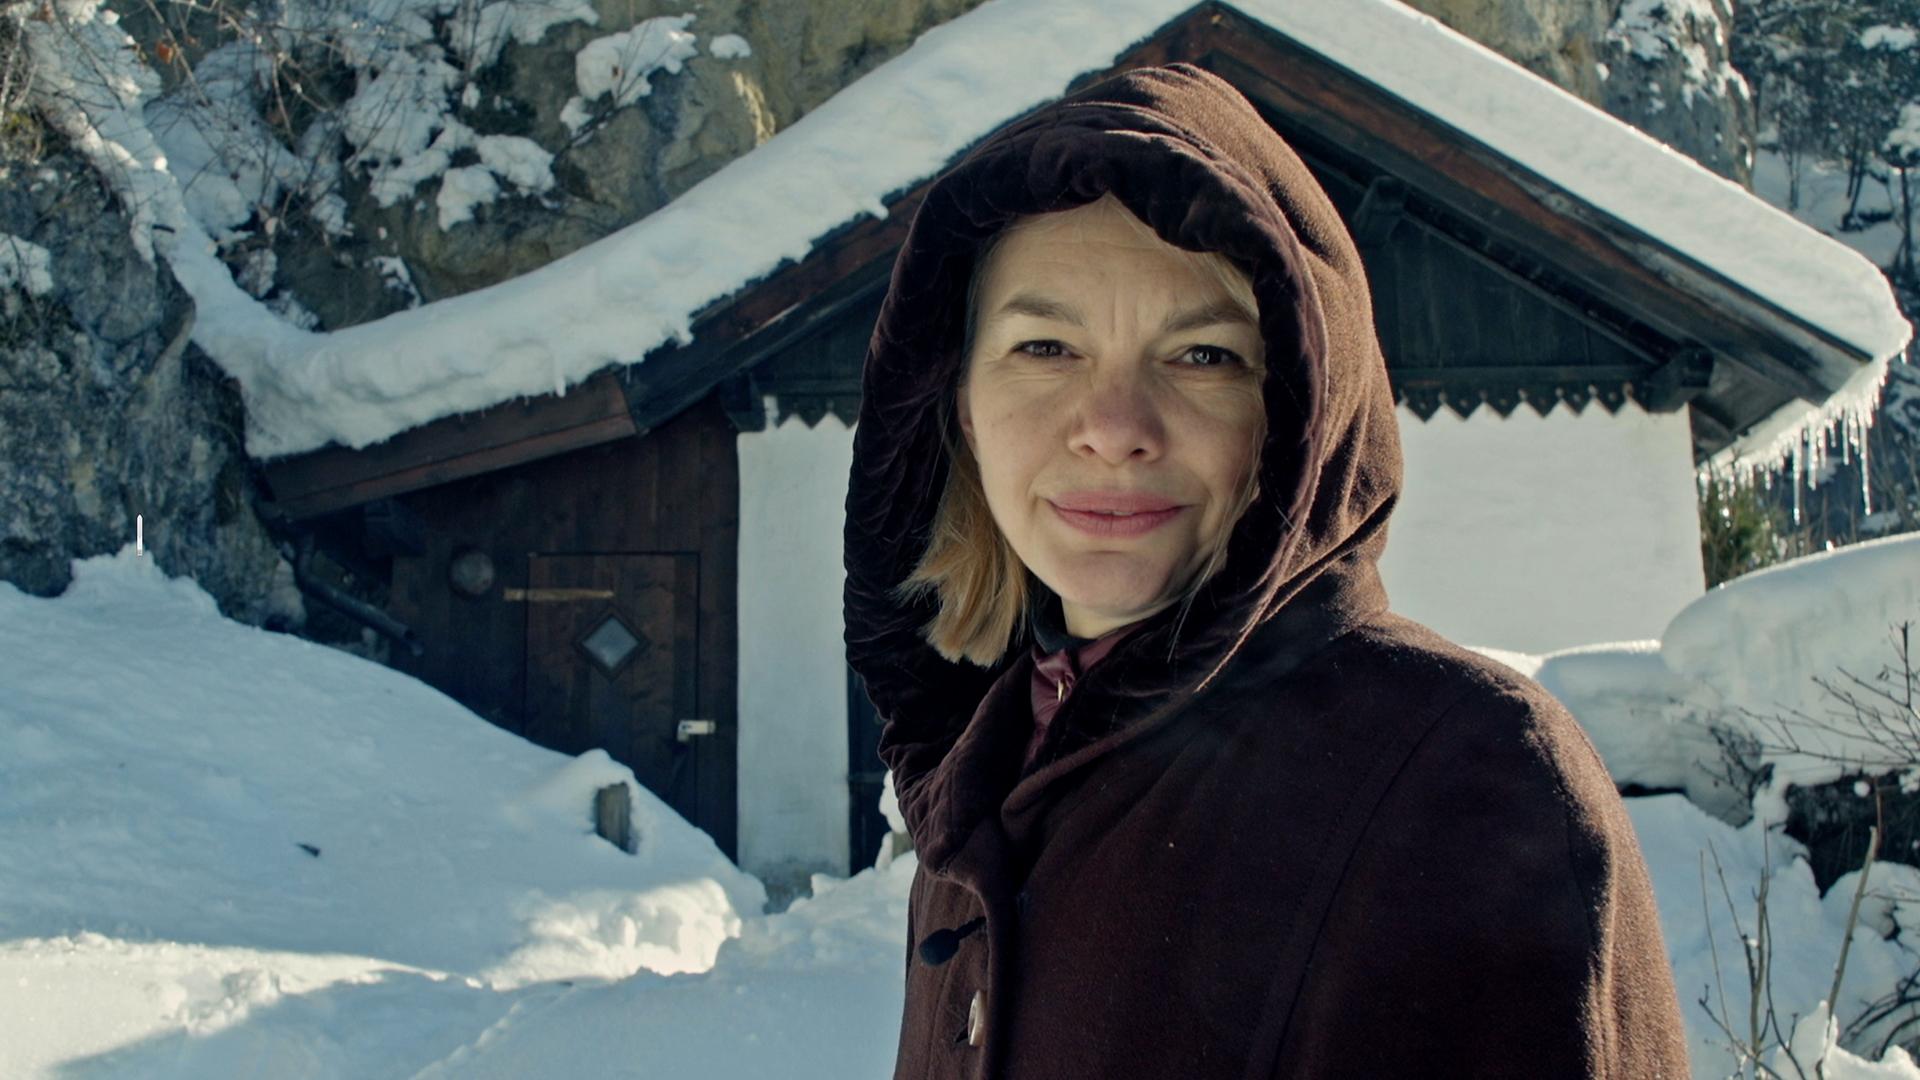 Austrian town seeks new hermit